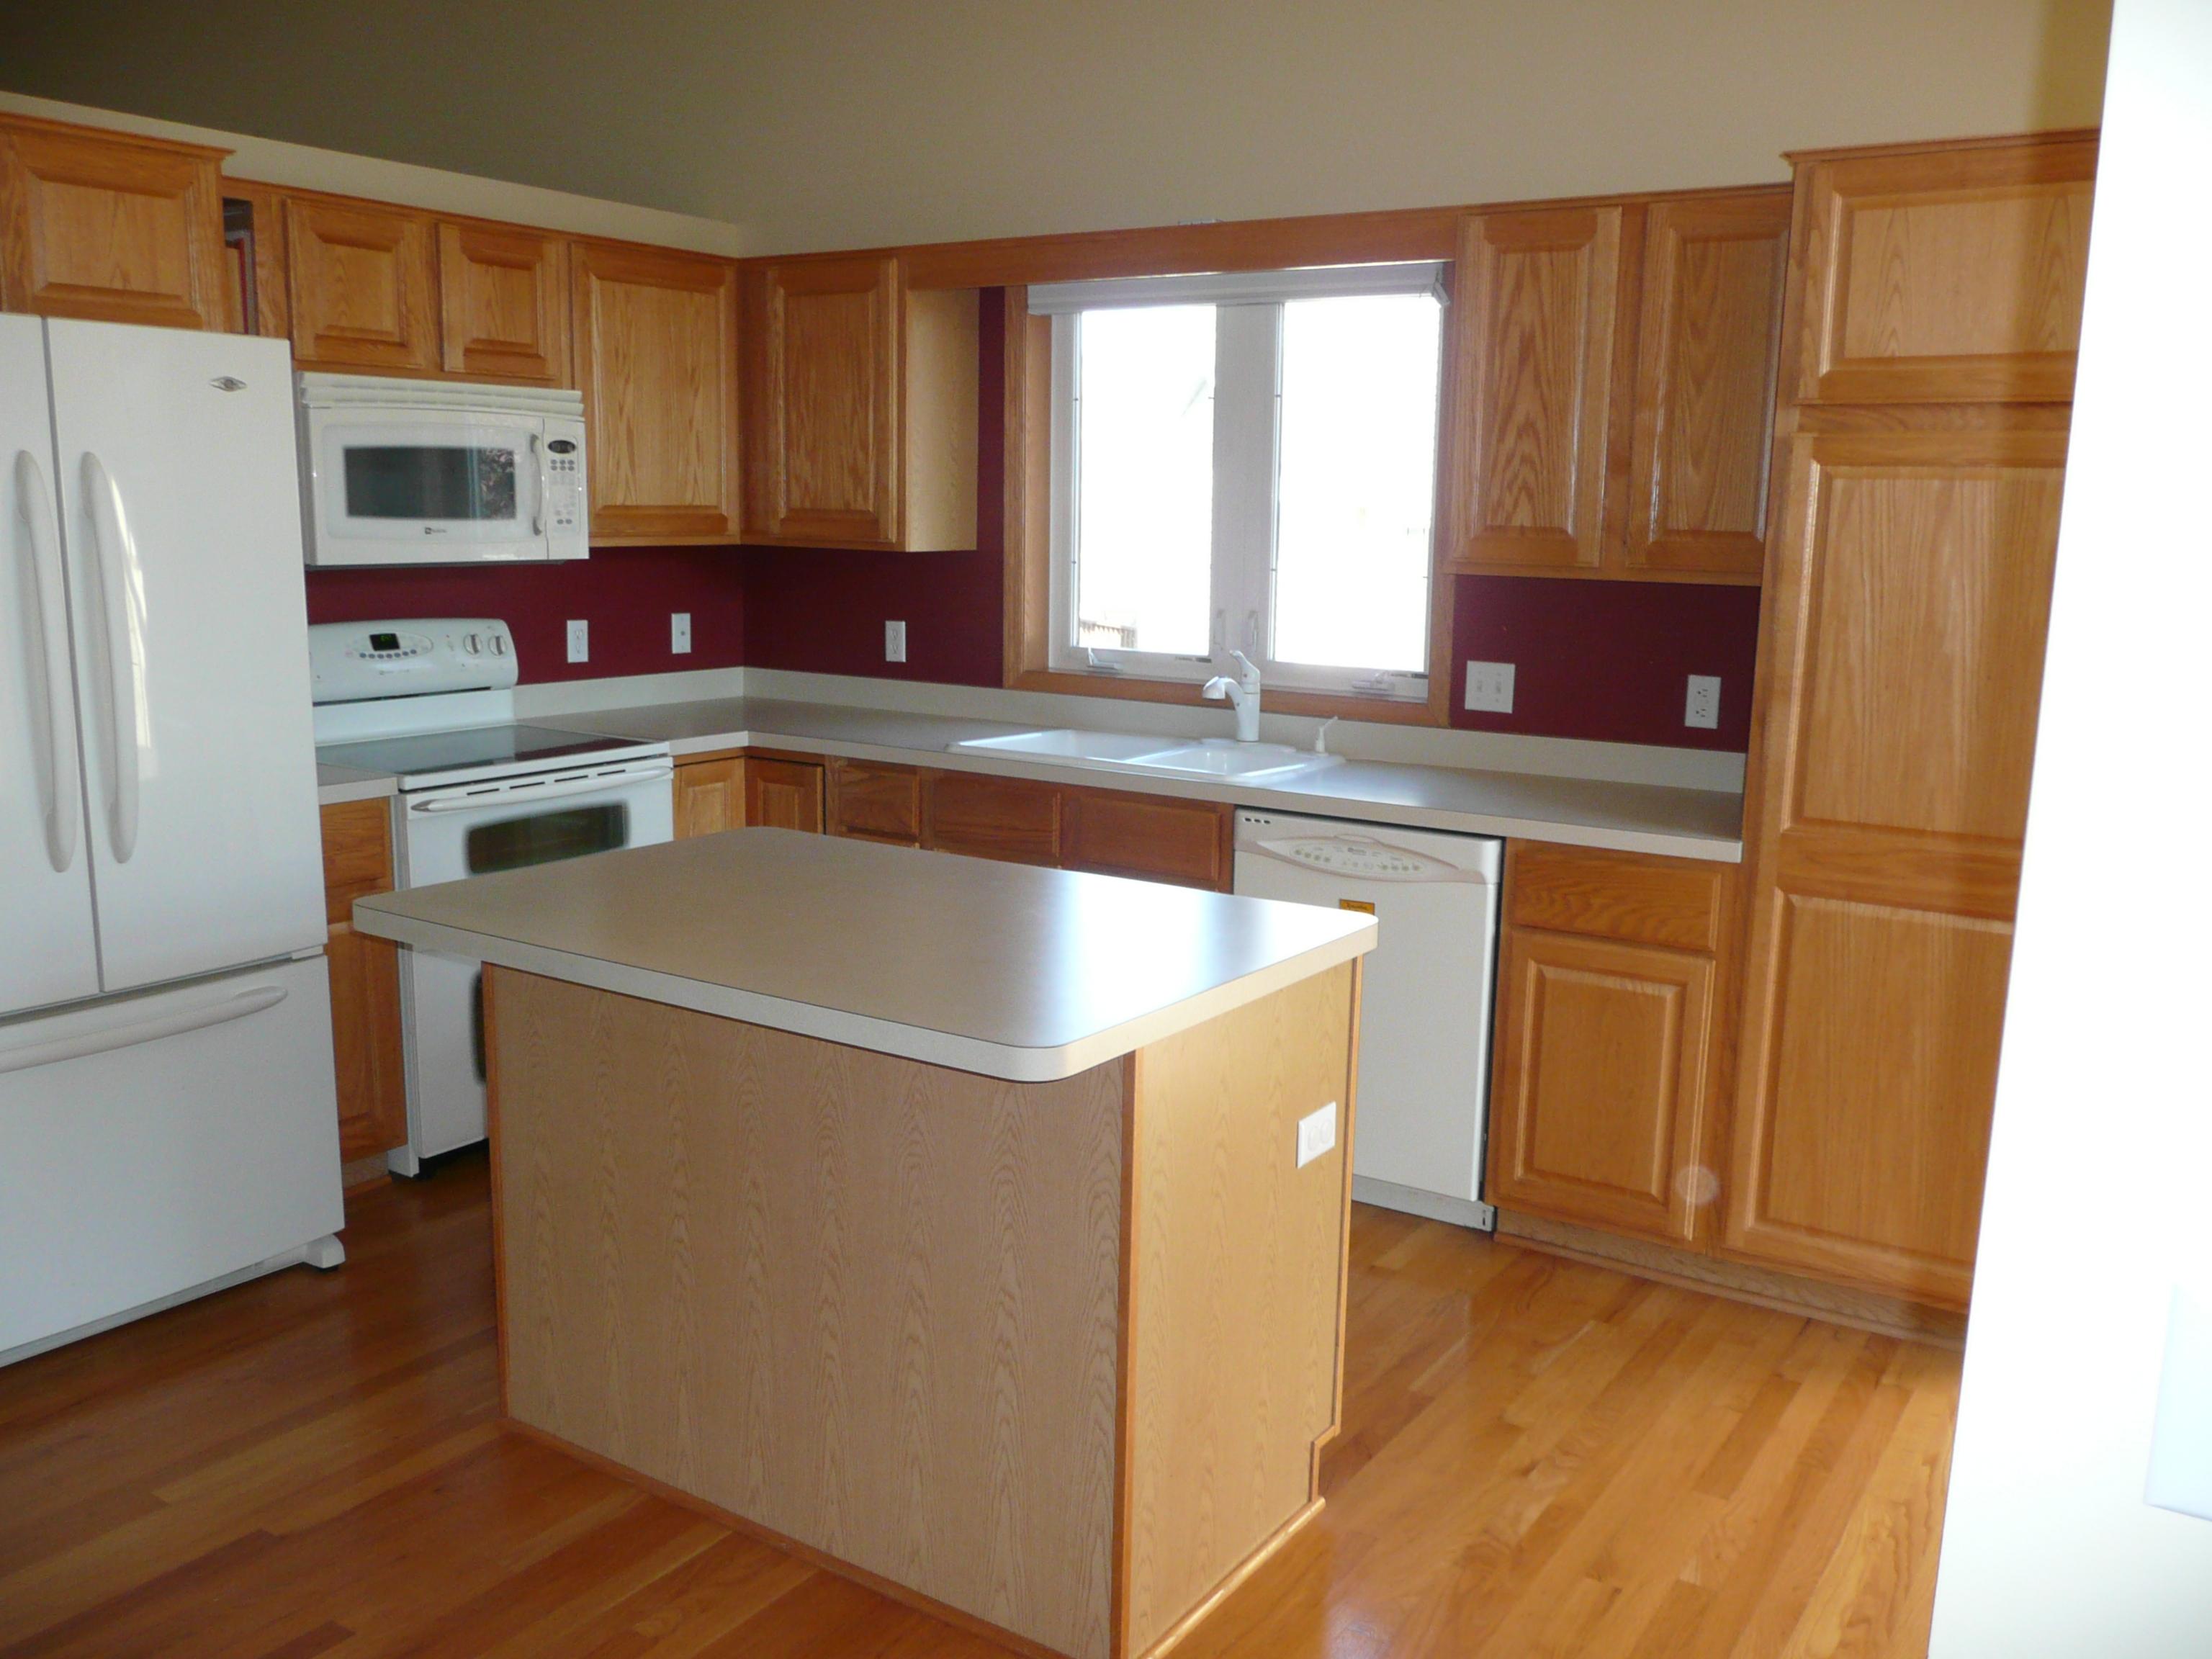 Kitchen island furniture photo - 3